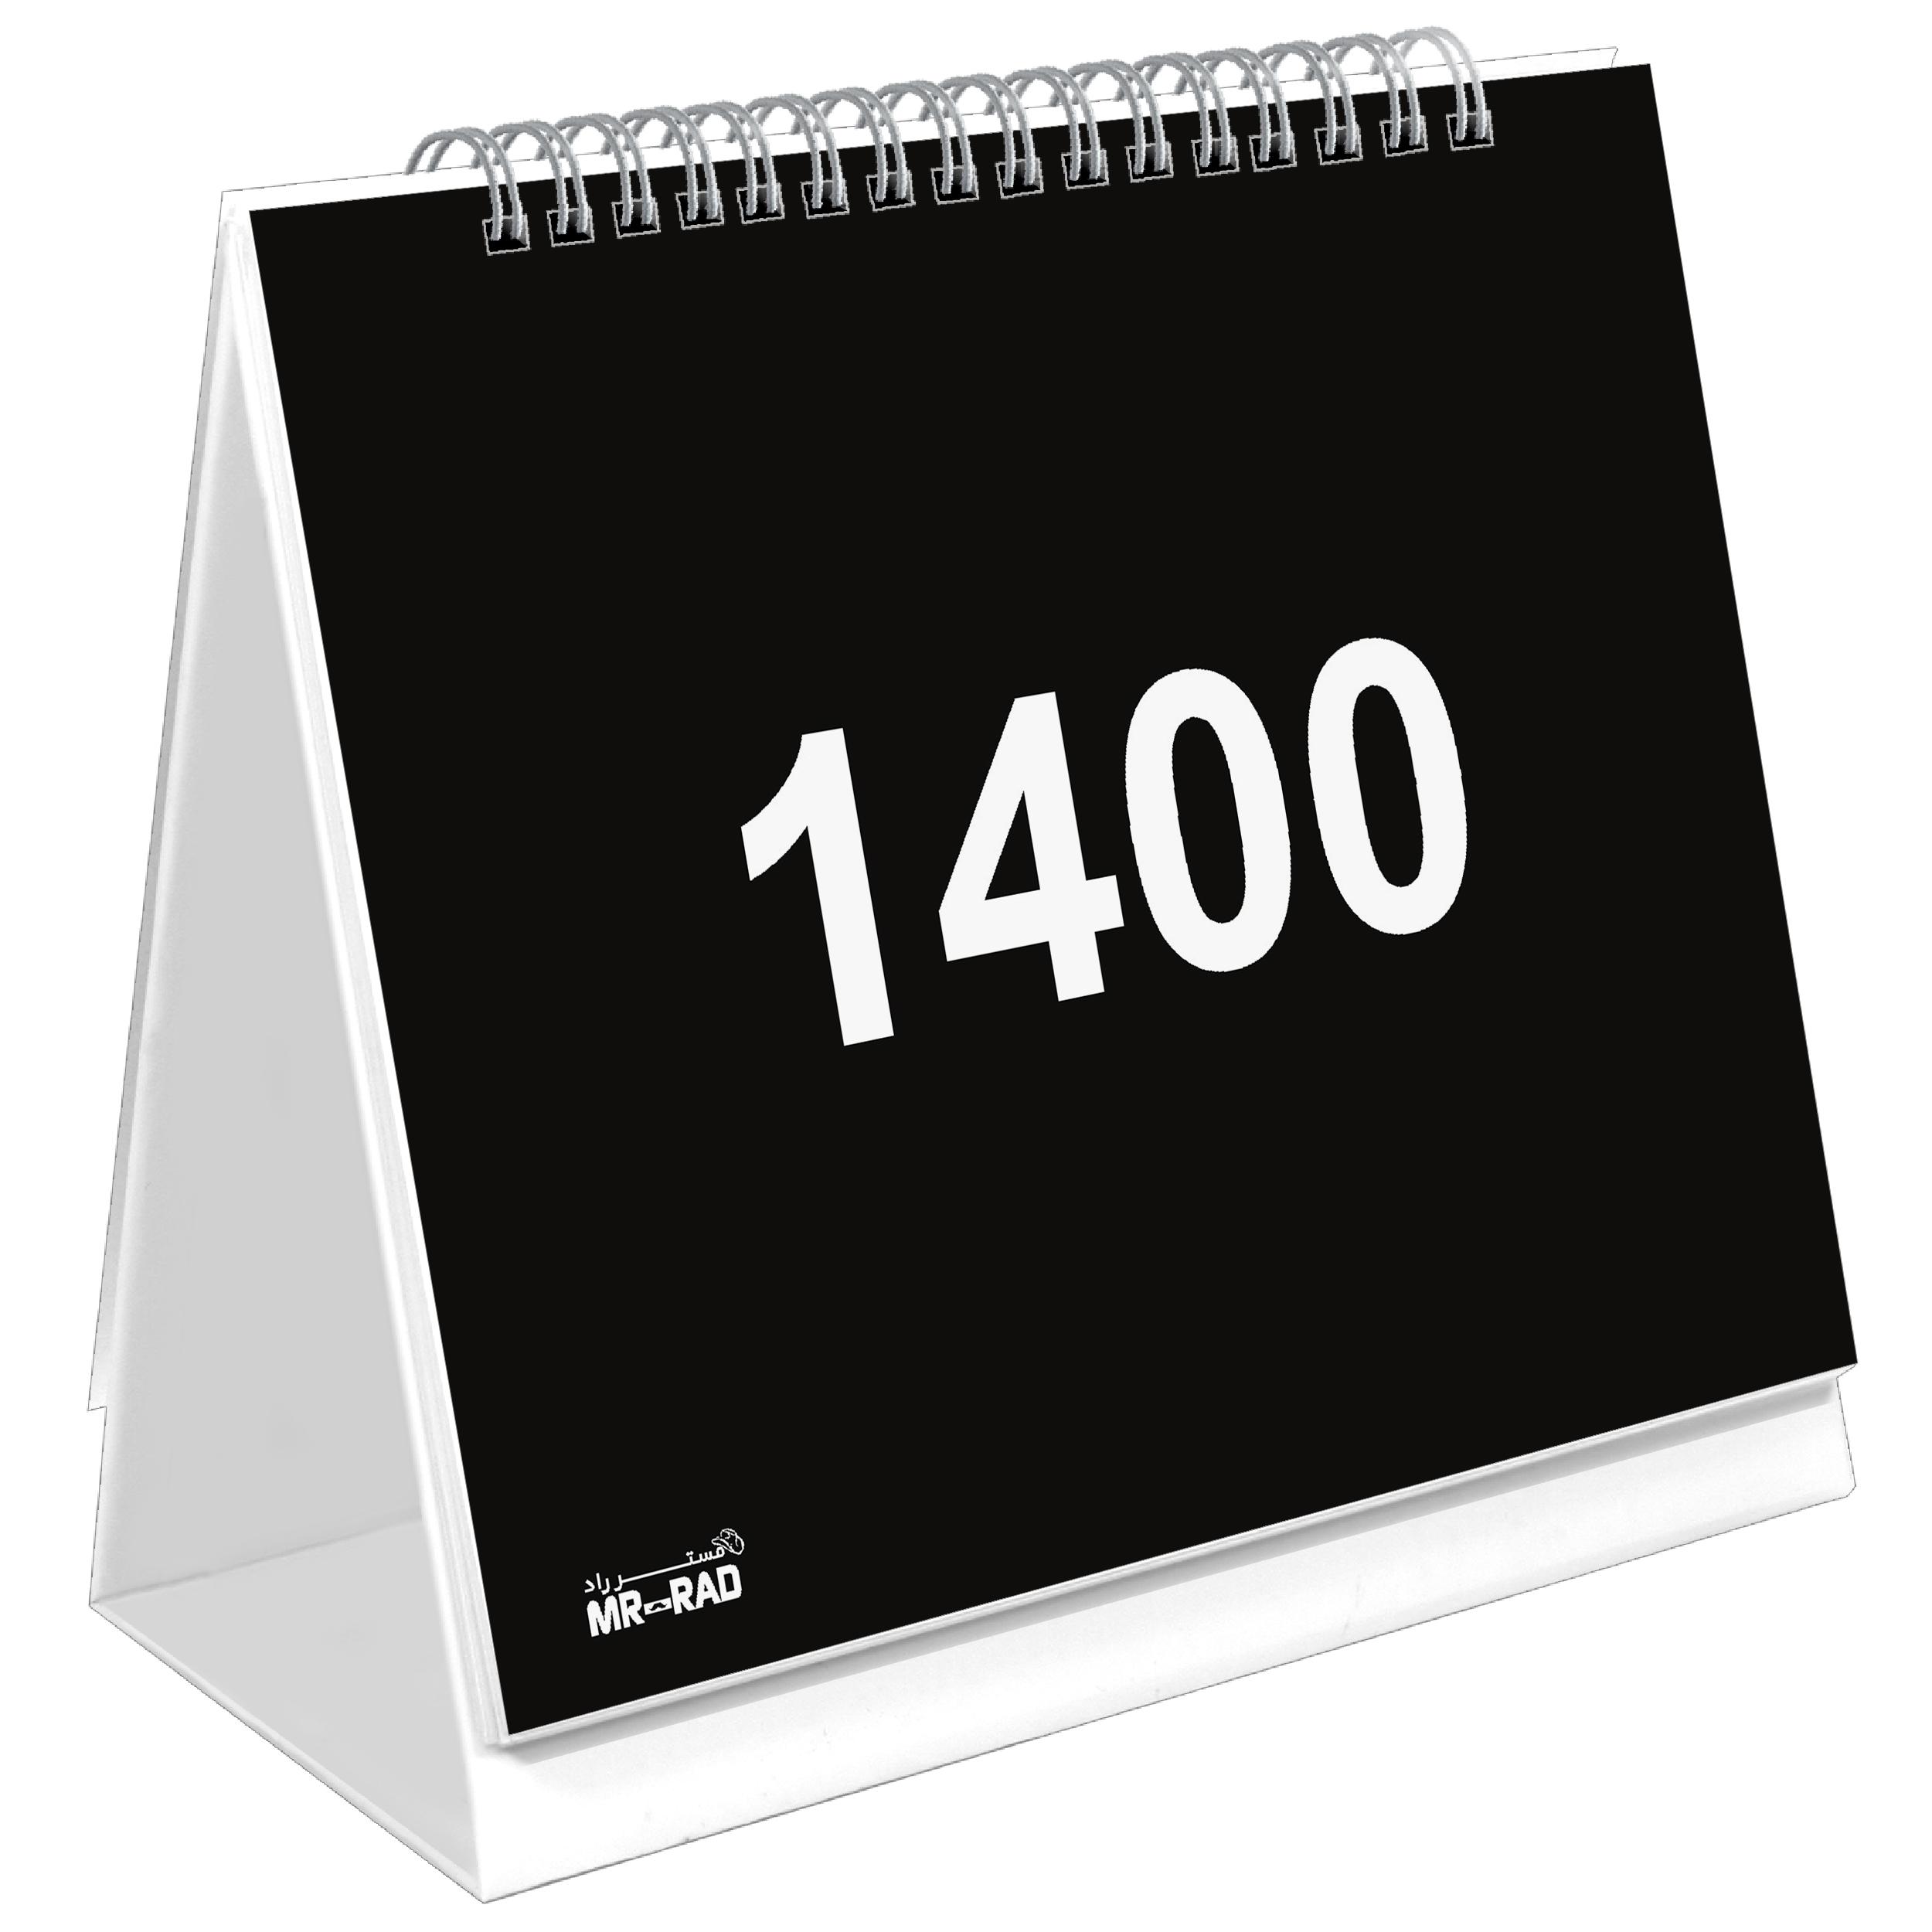 تقویم رومیزیسال 1400  مستر راد مدل endar 2021 کد s20 thumb